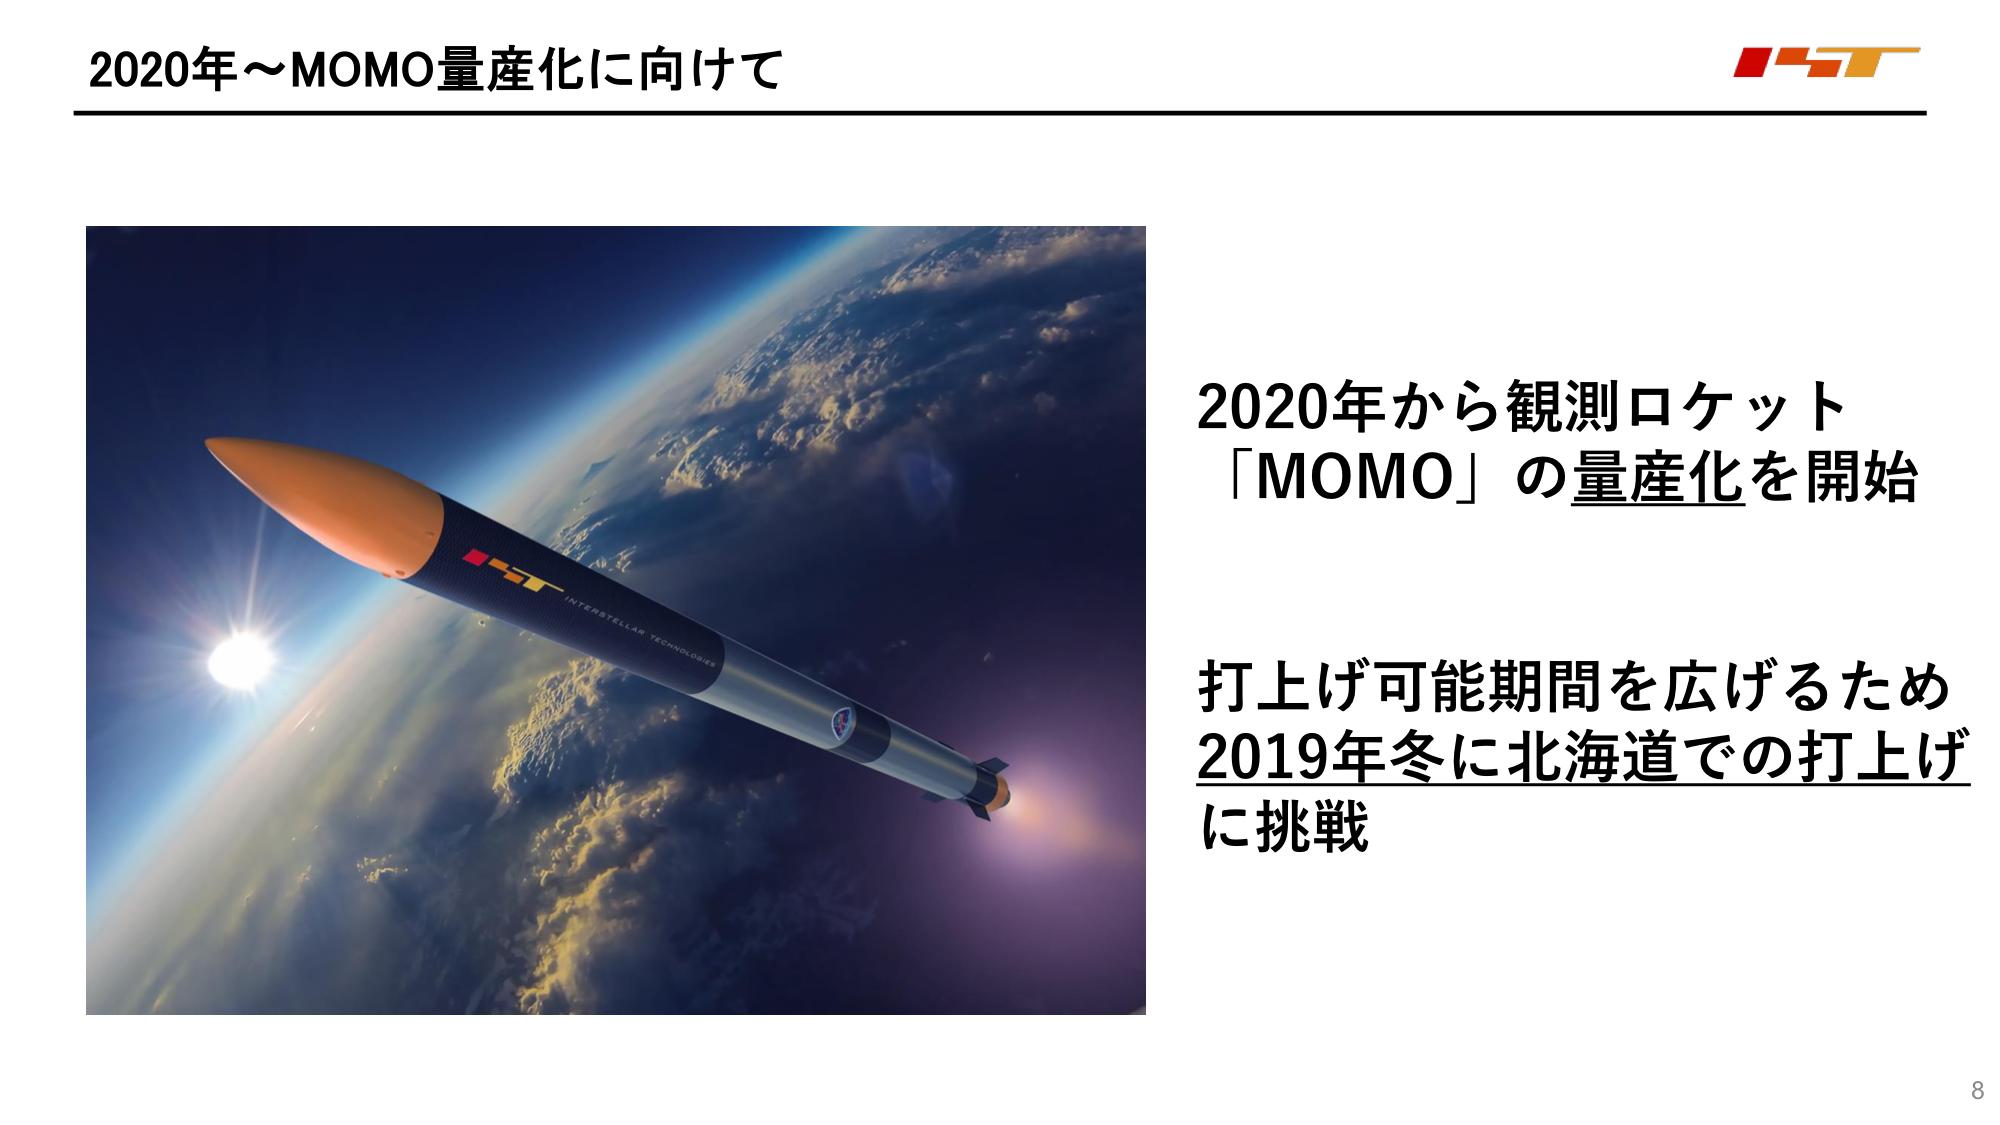 f:id:Imamura:20191126135043p:plain